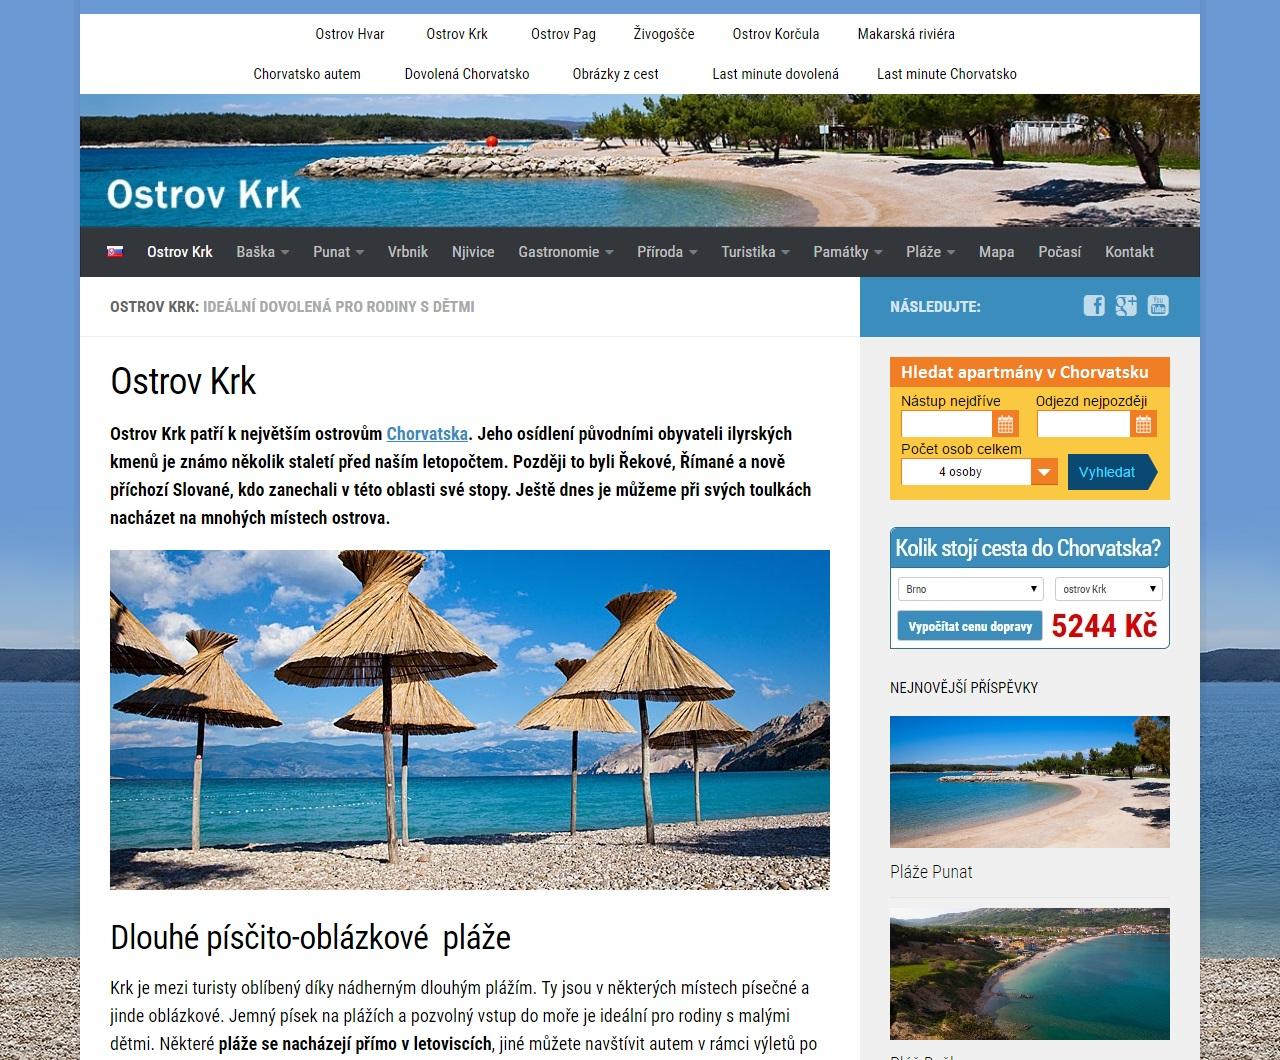 Ostrov-krk.eu